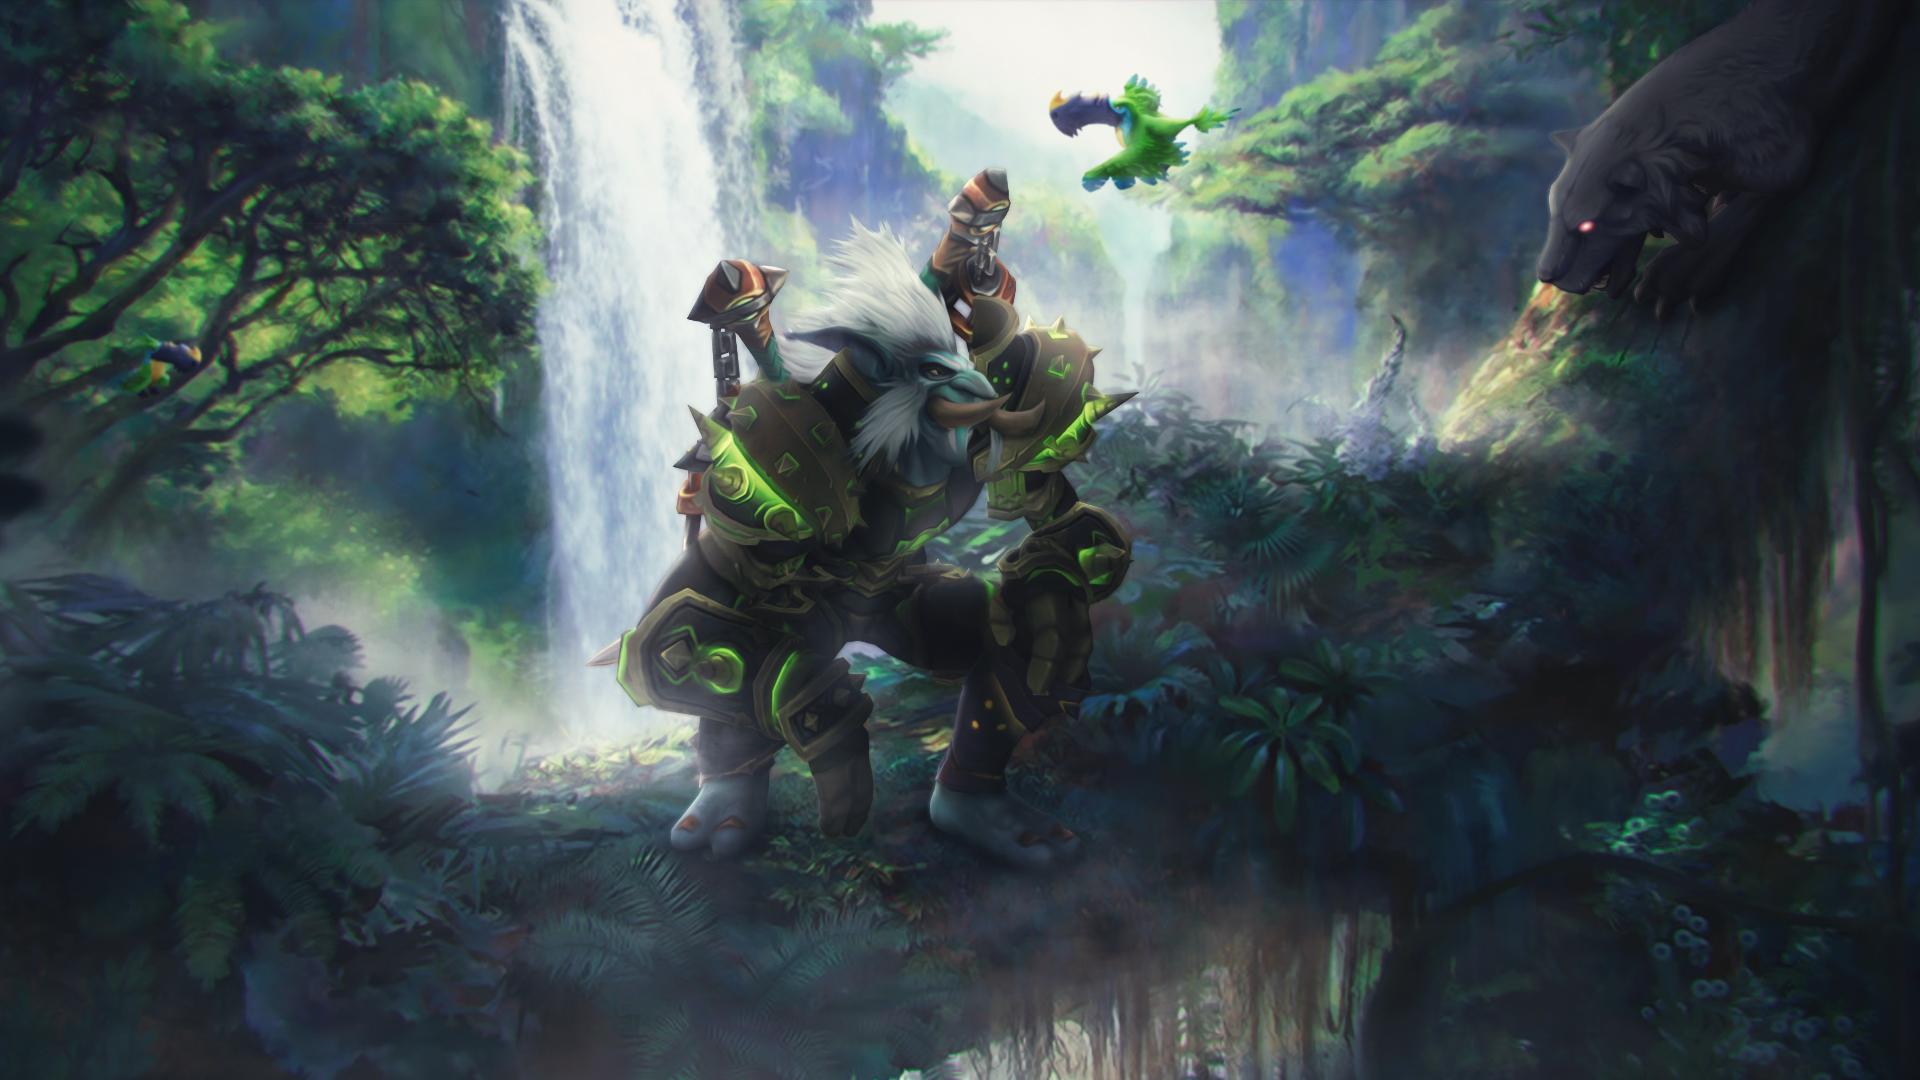 Animated Wallpaper World Of Warcraft By Ginnypinnyart On Deviantart